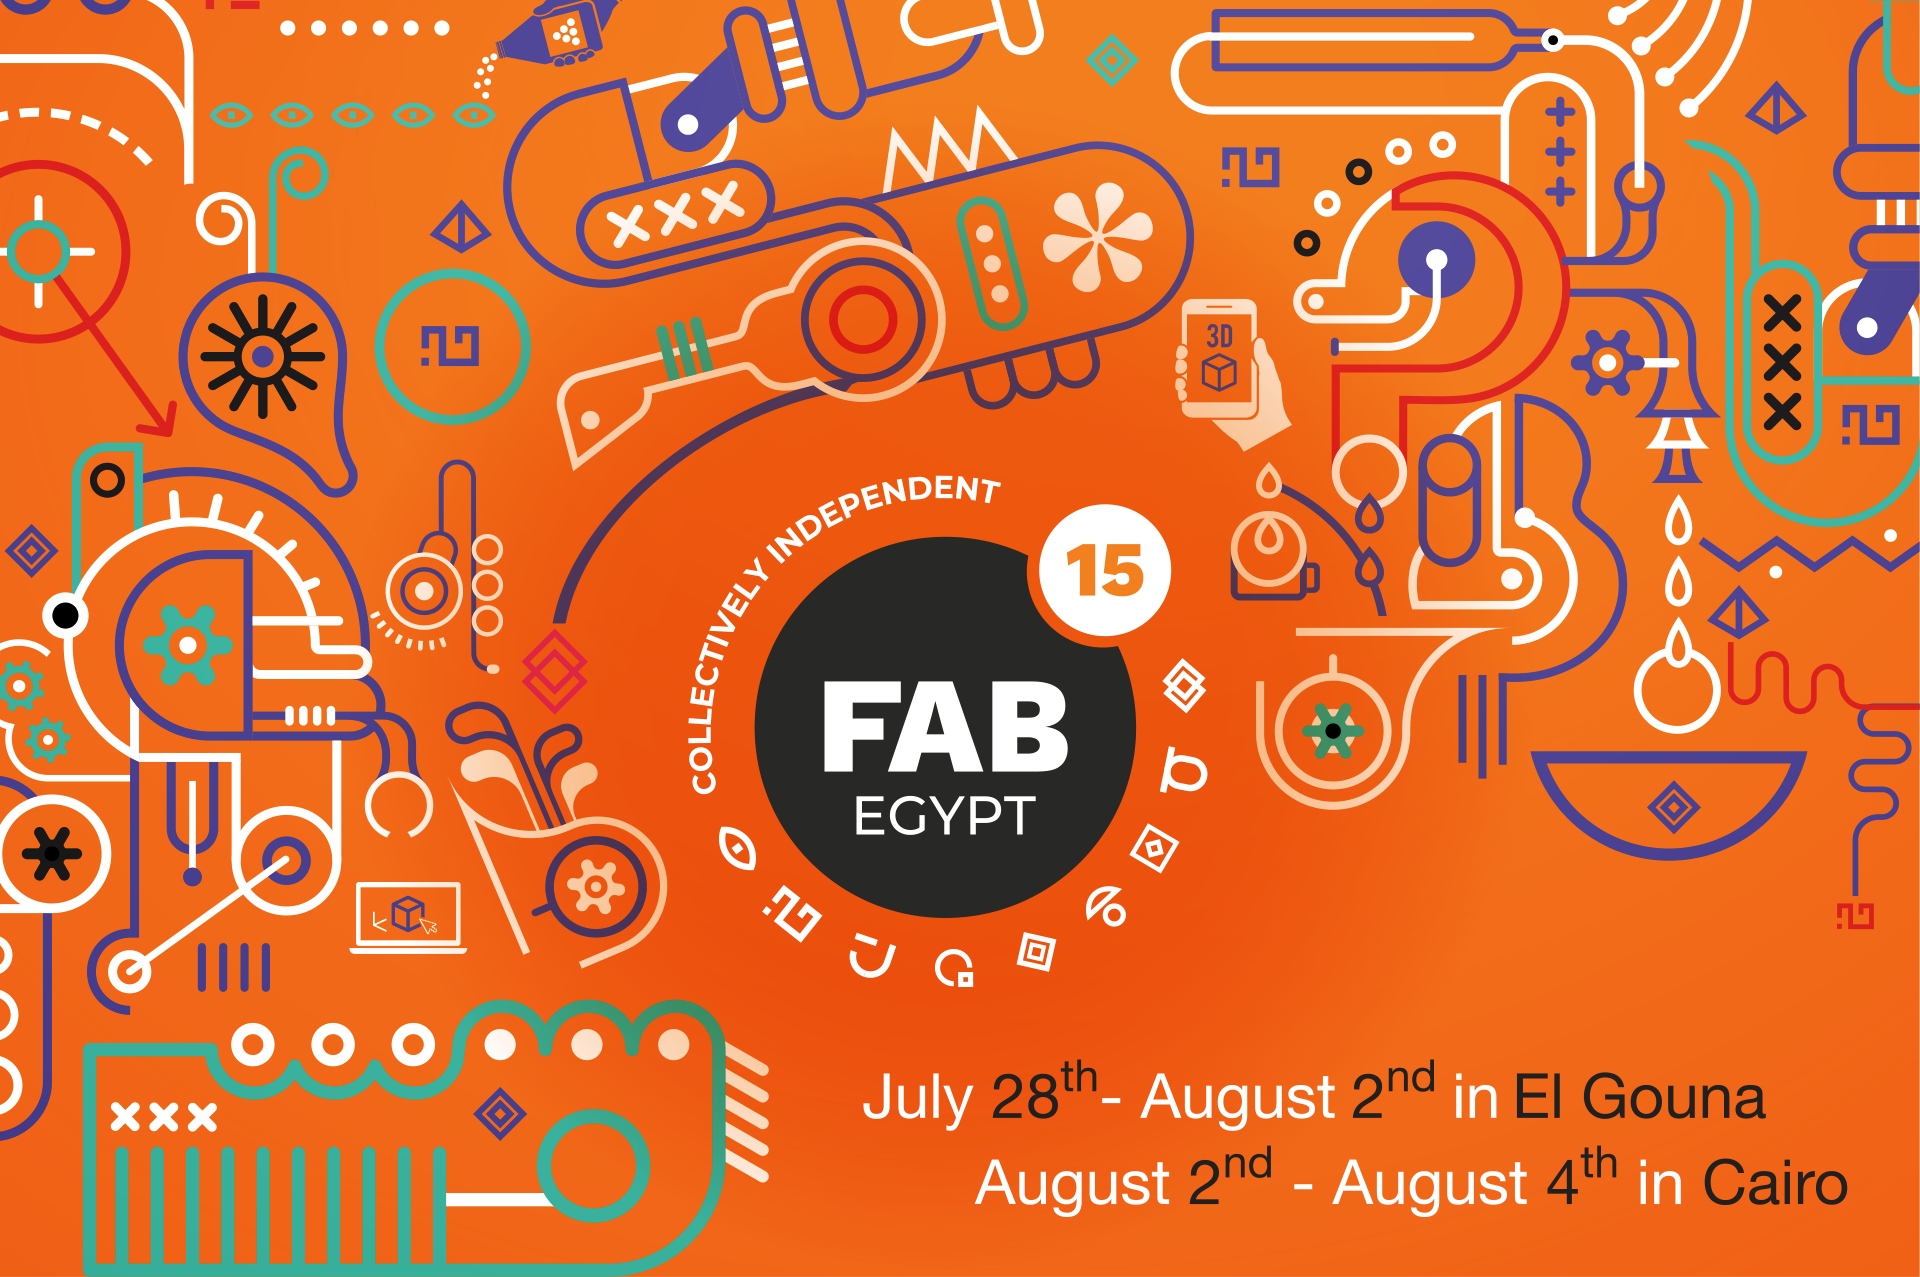 fab15 egypt announcement